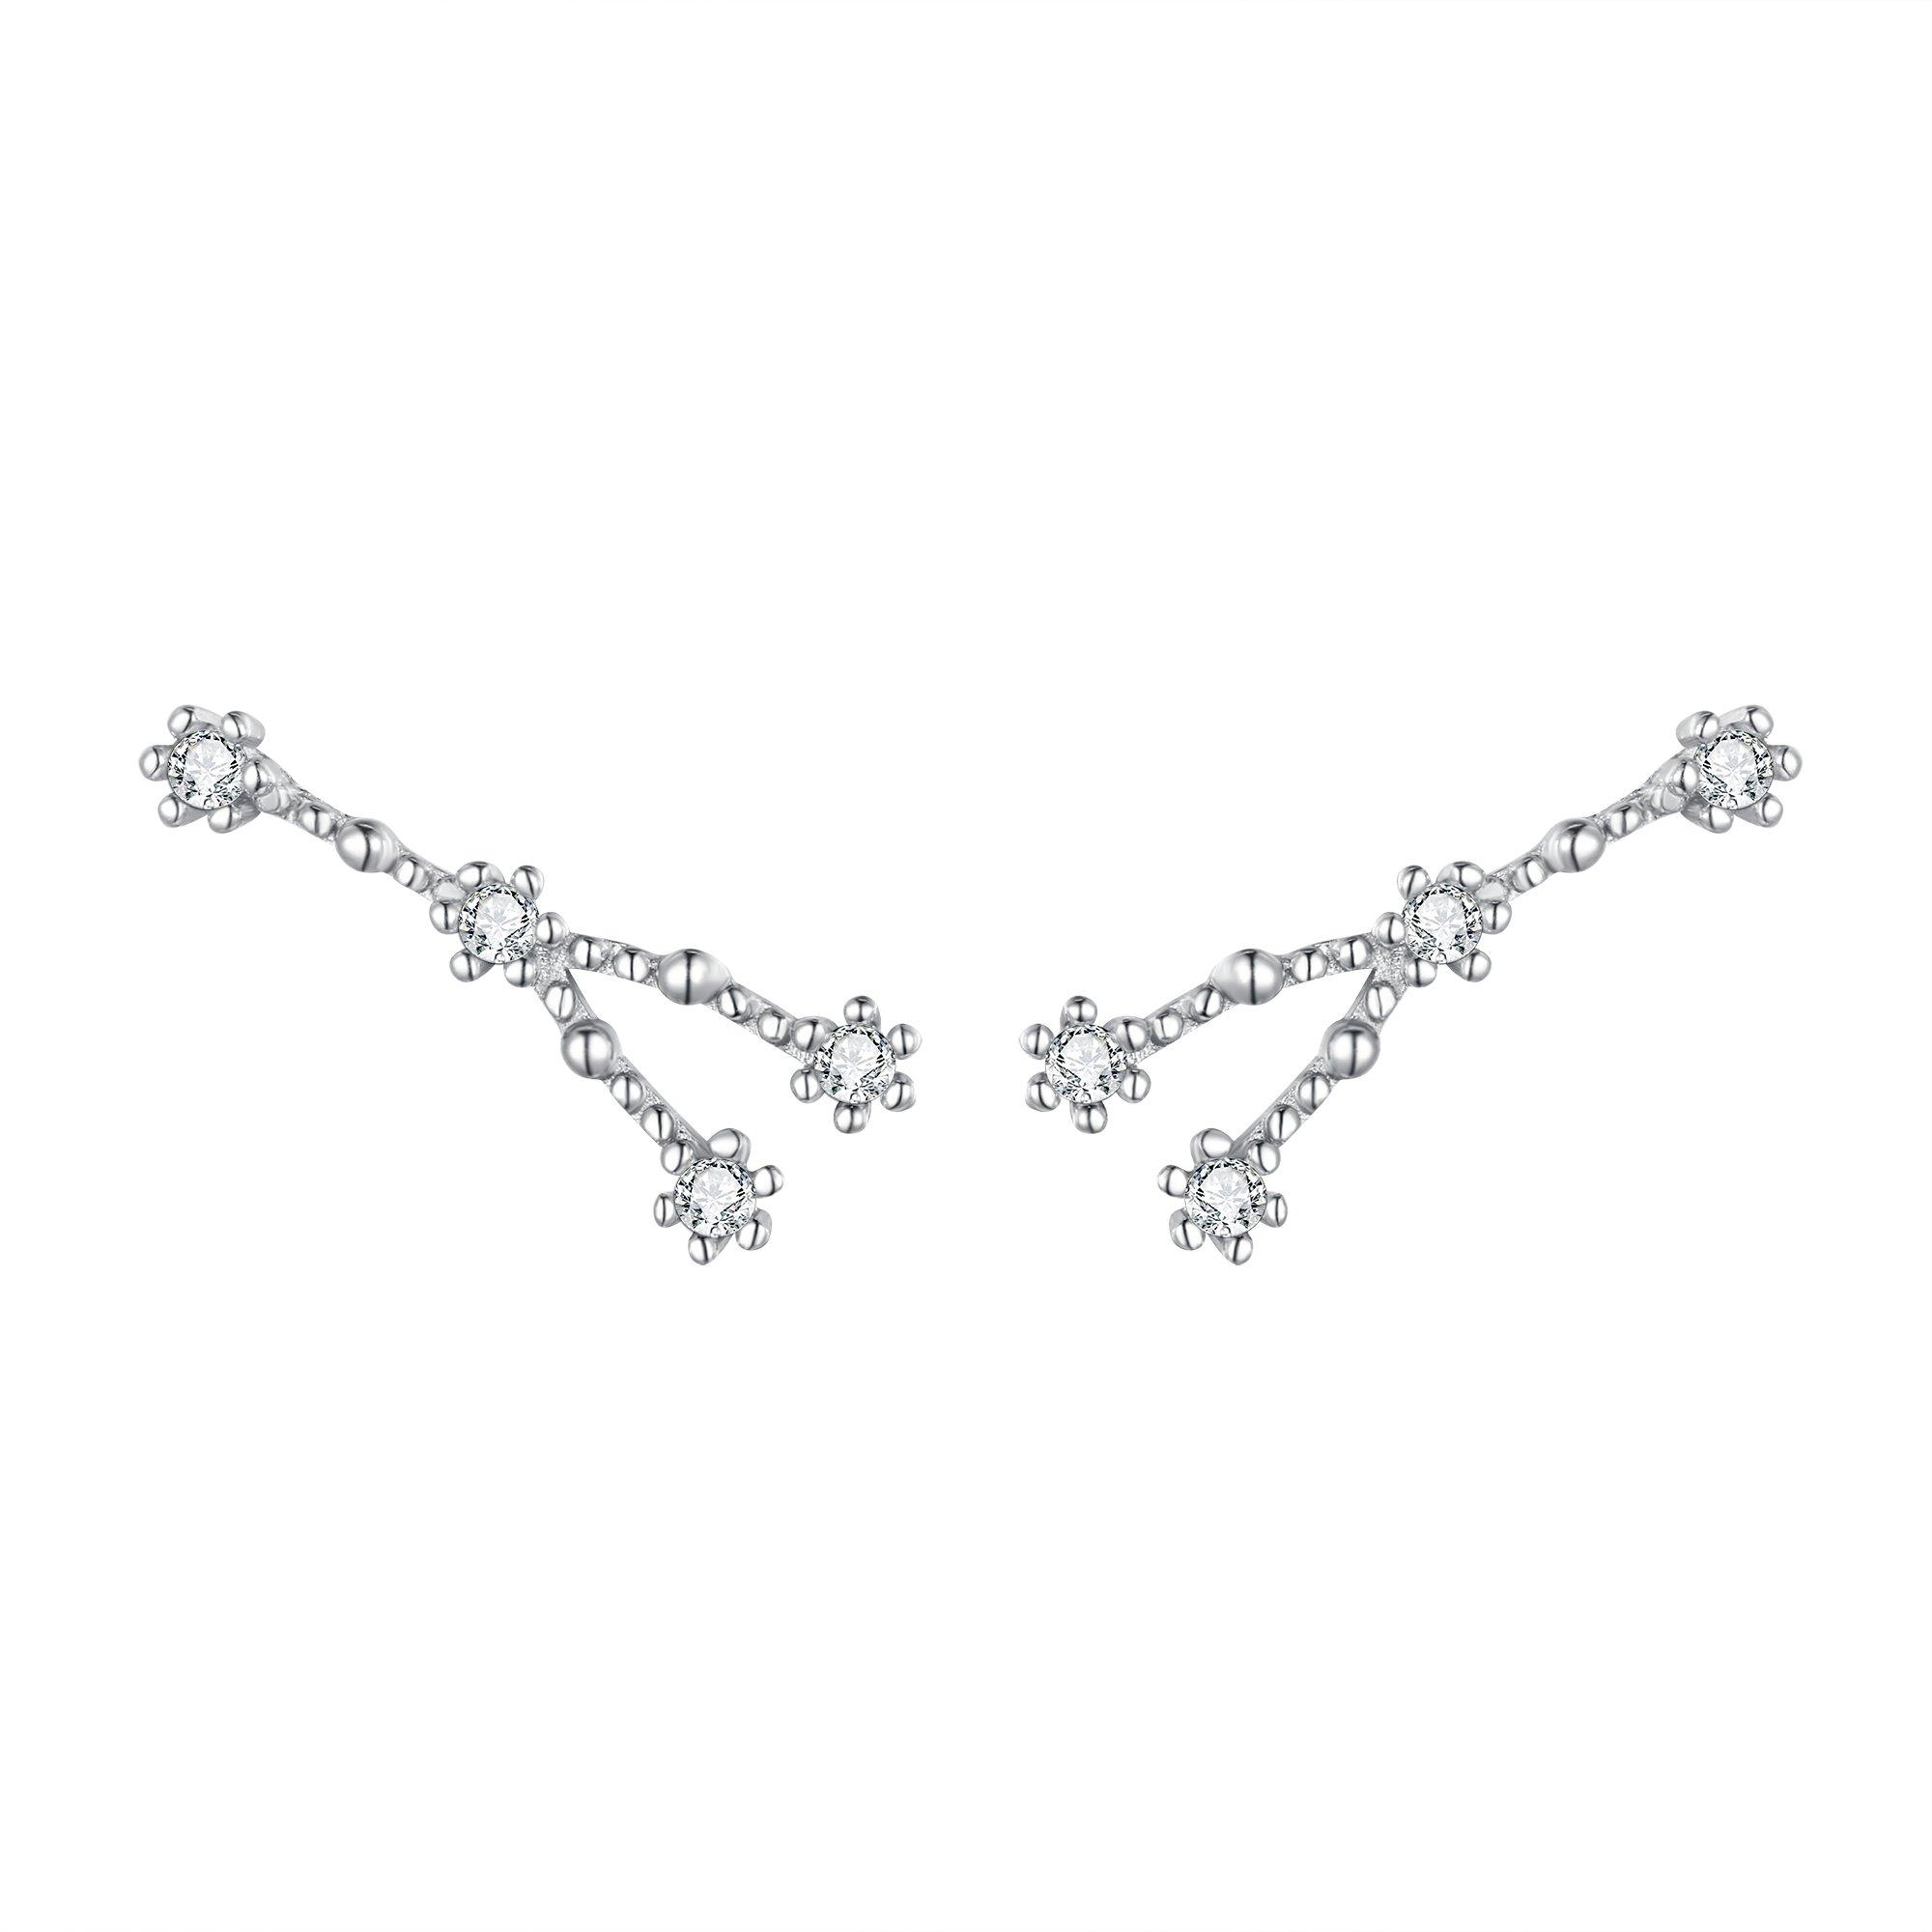 BriLove Women 925 Sterling Silver CZ Cancer Crawler Earrings - Horoscope Zodiac 12 Constellation Astrology Ear Vine Post Earrings